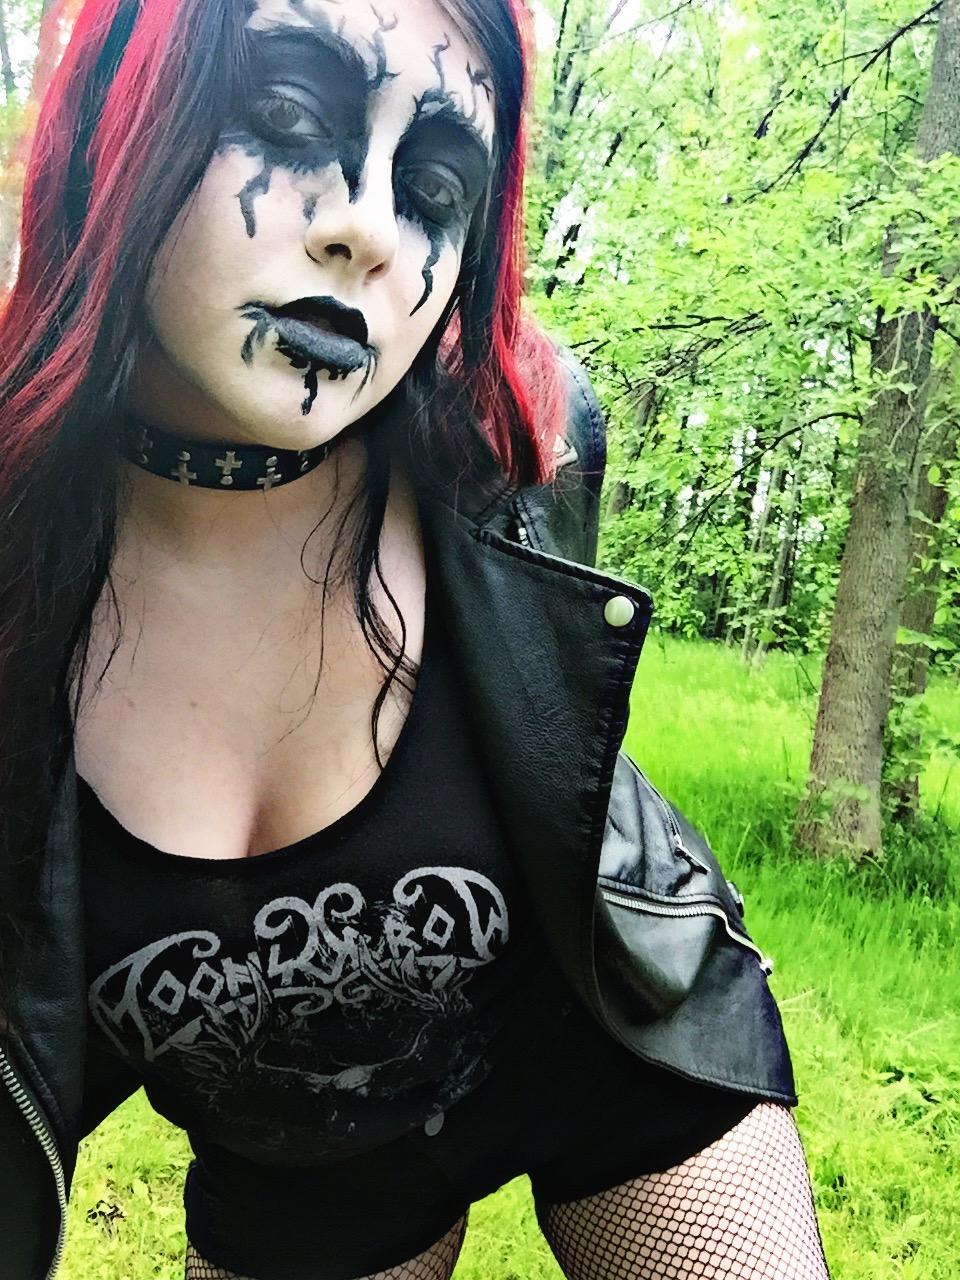 Girl black metal BBC NEWS